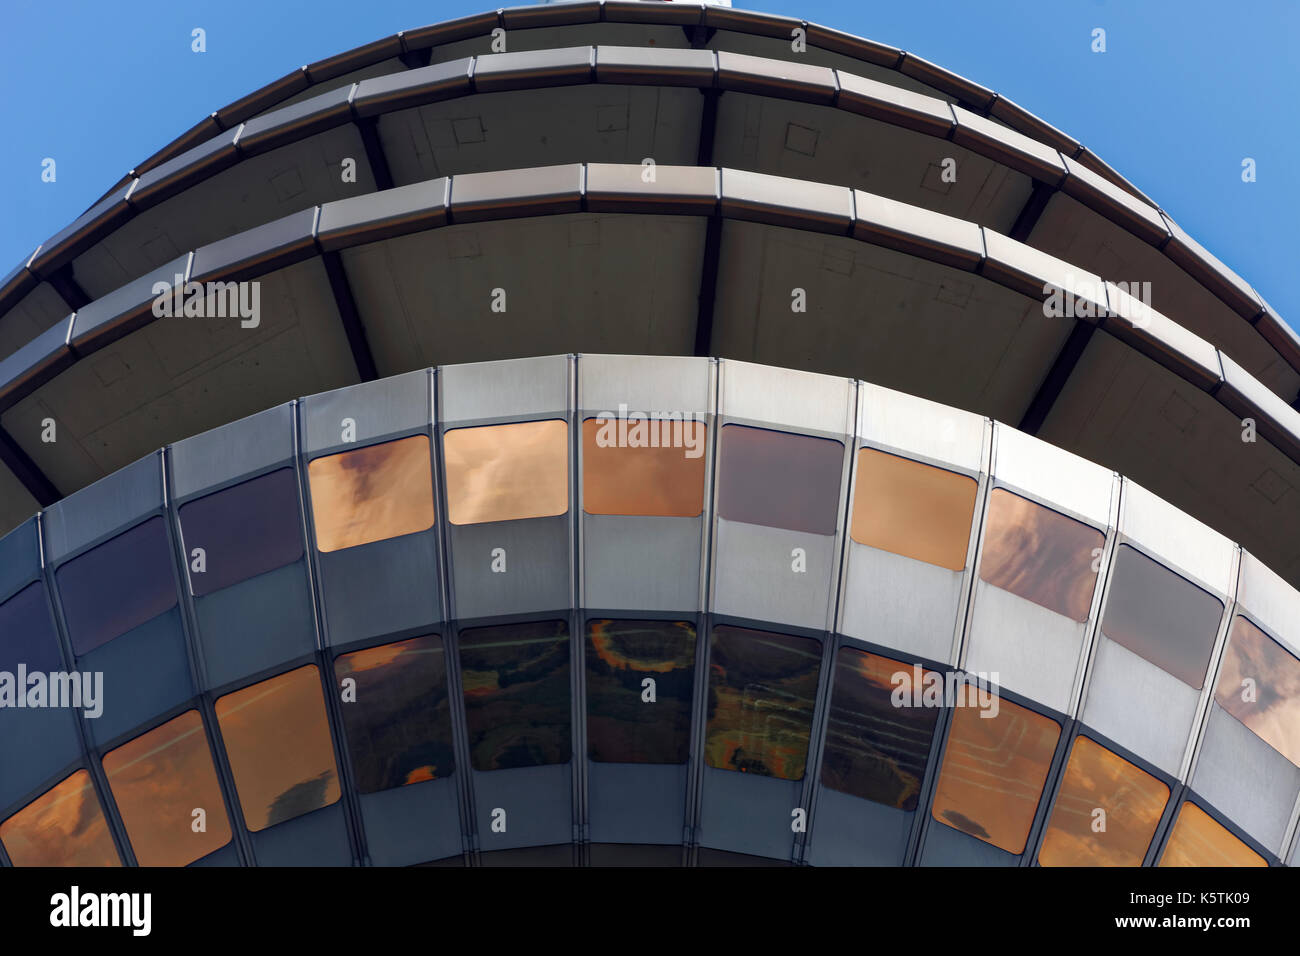 Windows, observation platform, telecommunications tower, Nuremberg, Middle Franconia, Franconia, Bavaria, Germany - Stock Image